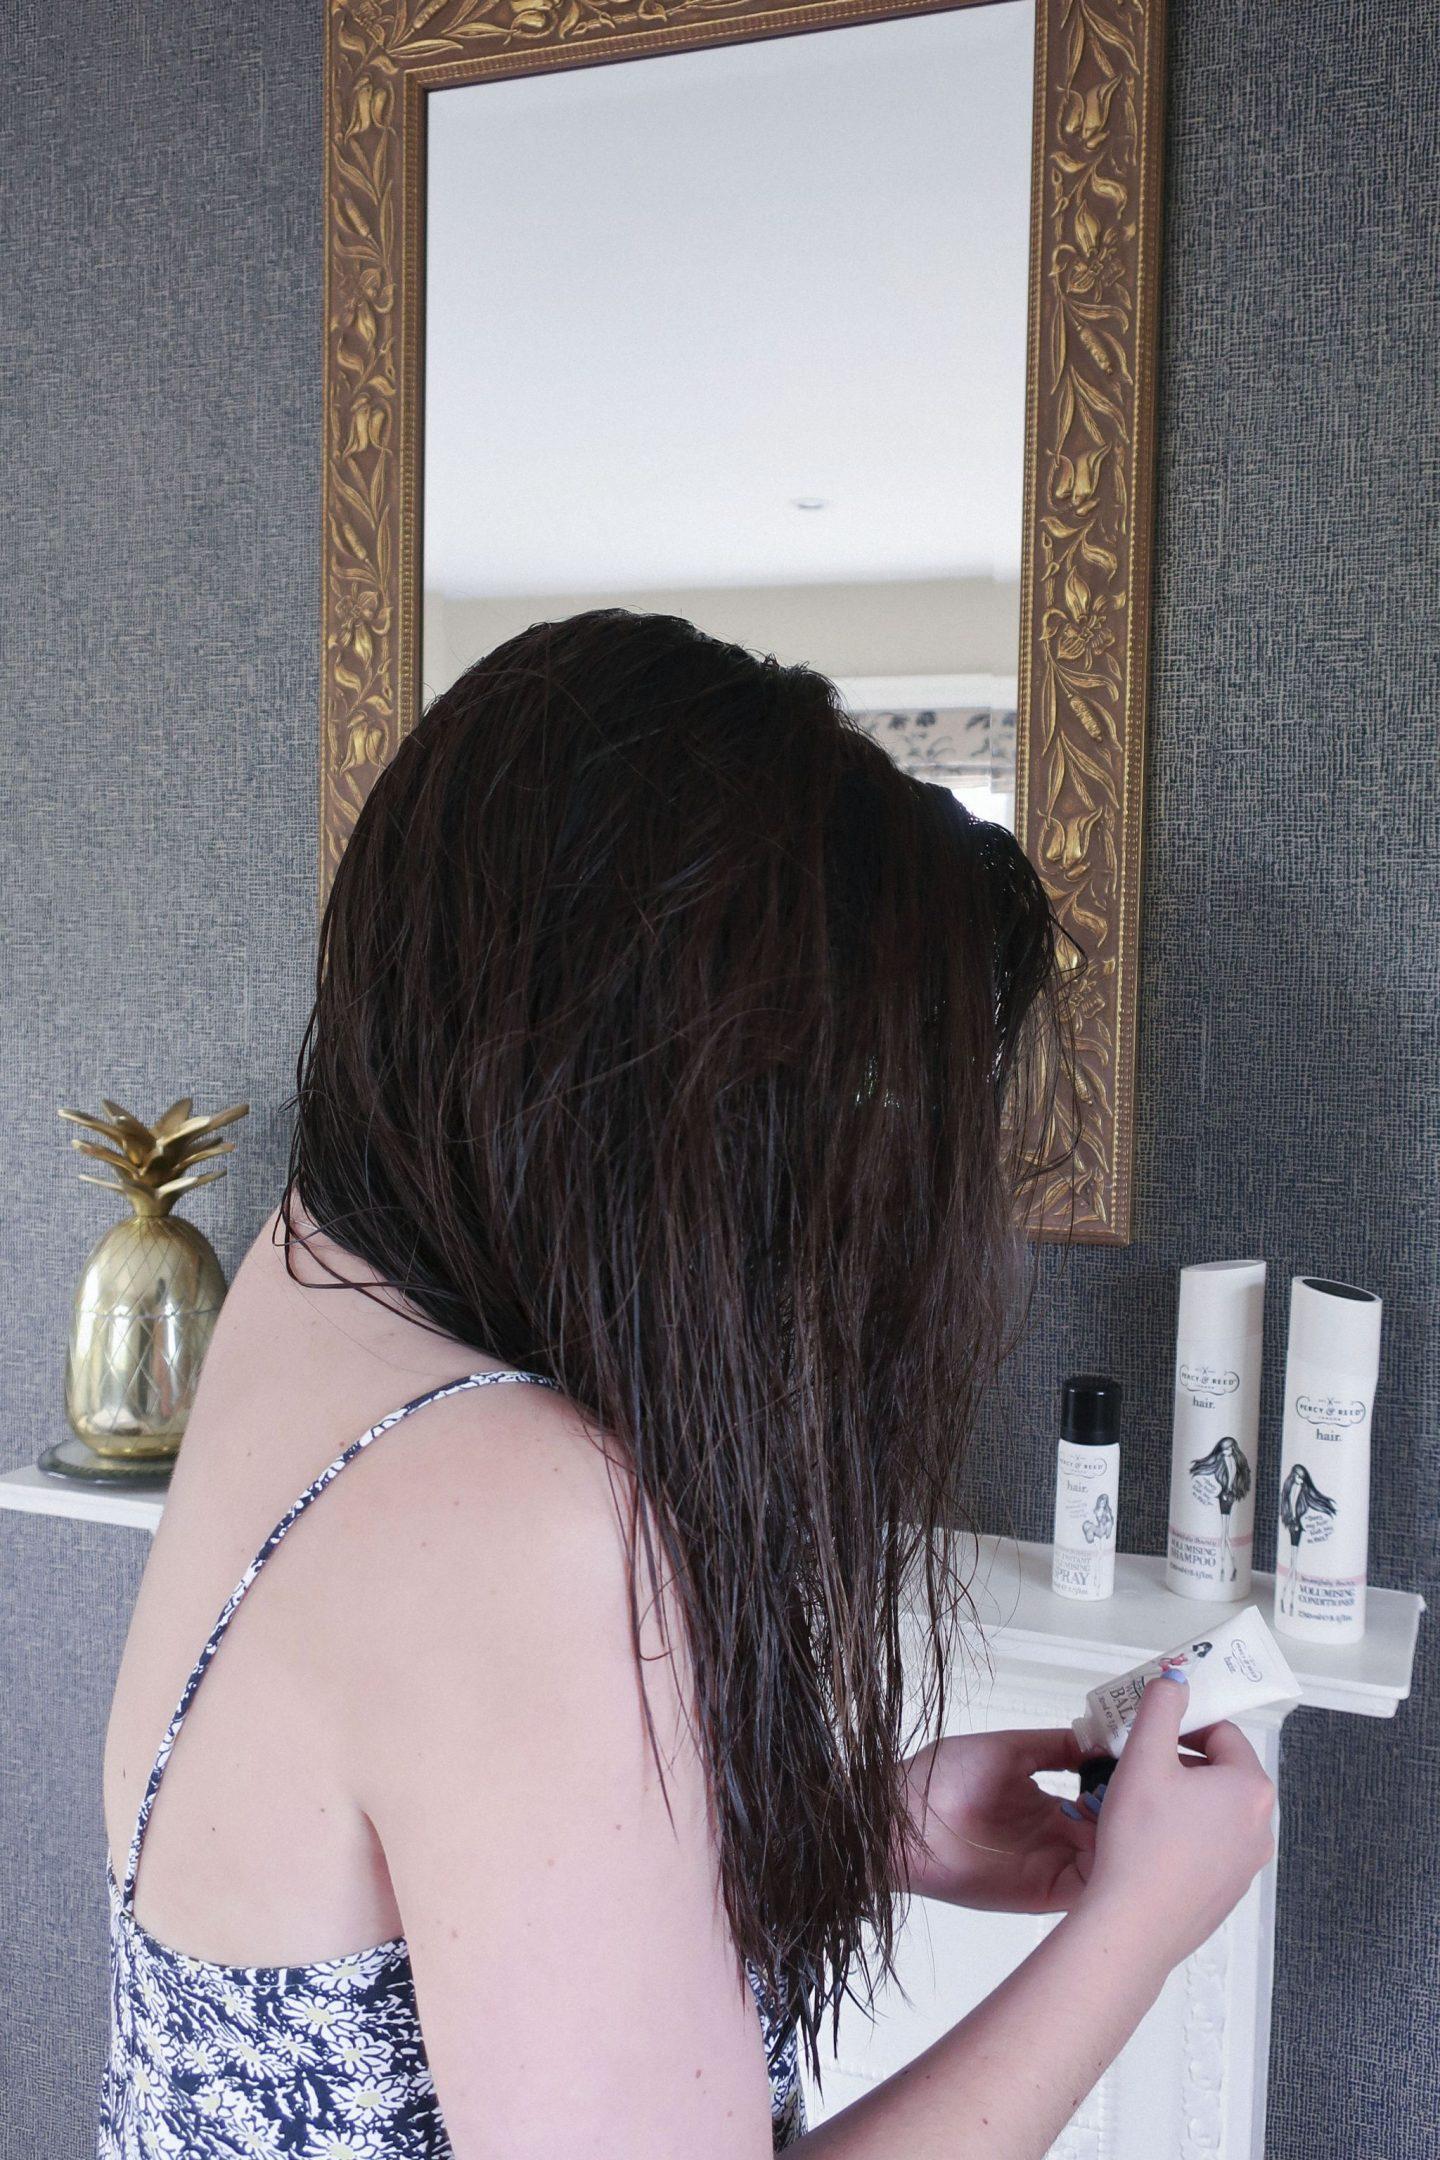 haircare routine